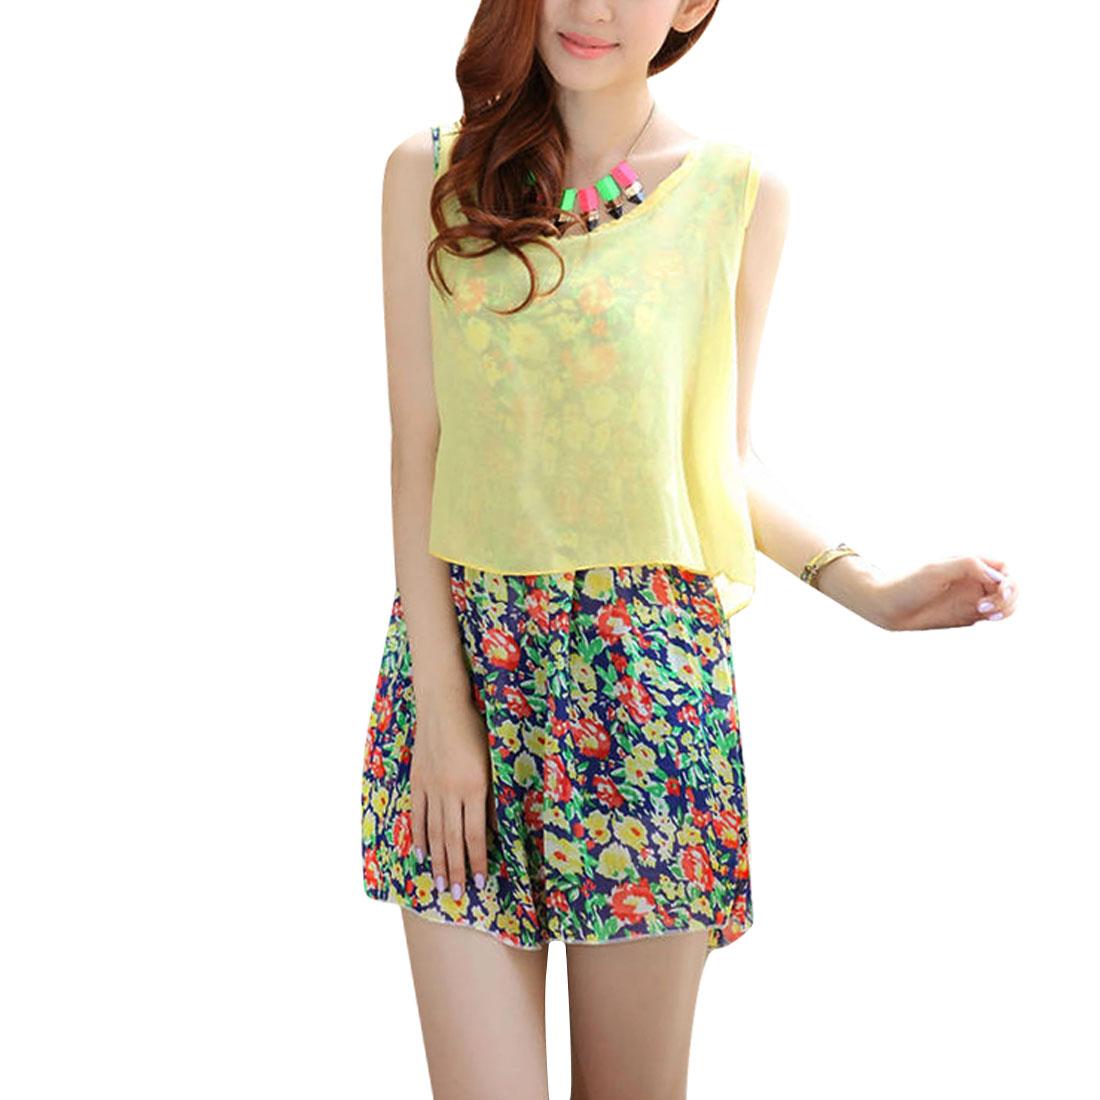 Women Round Neck Semi Sheer Pullover Top w Sleeveless Dress Yellow XS